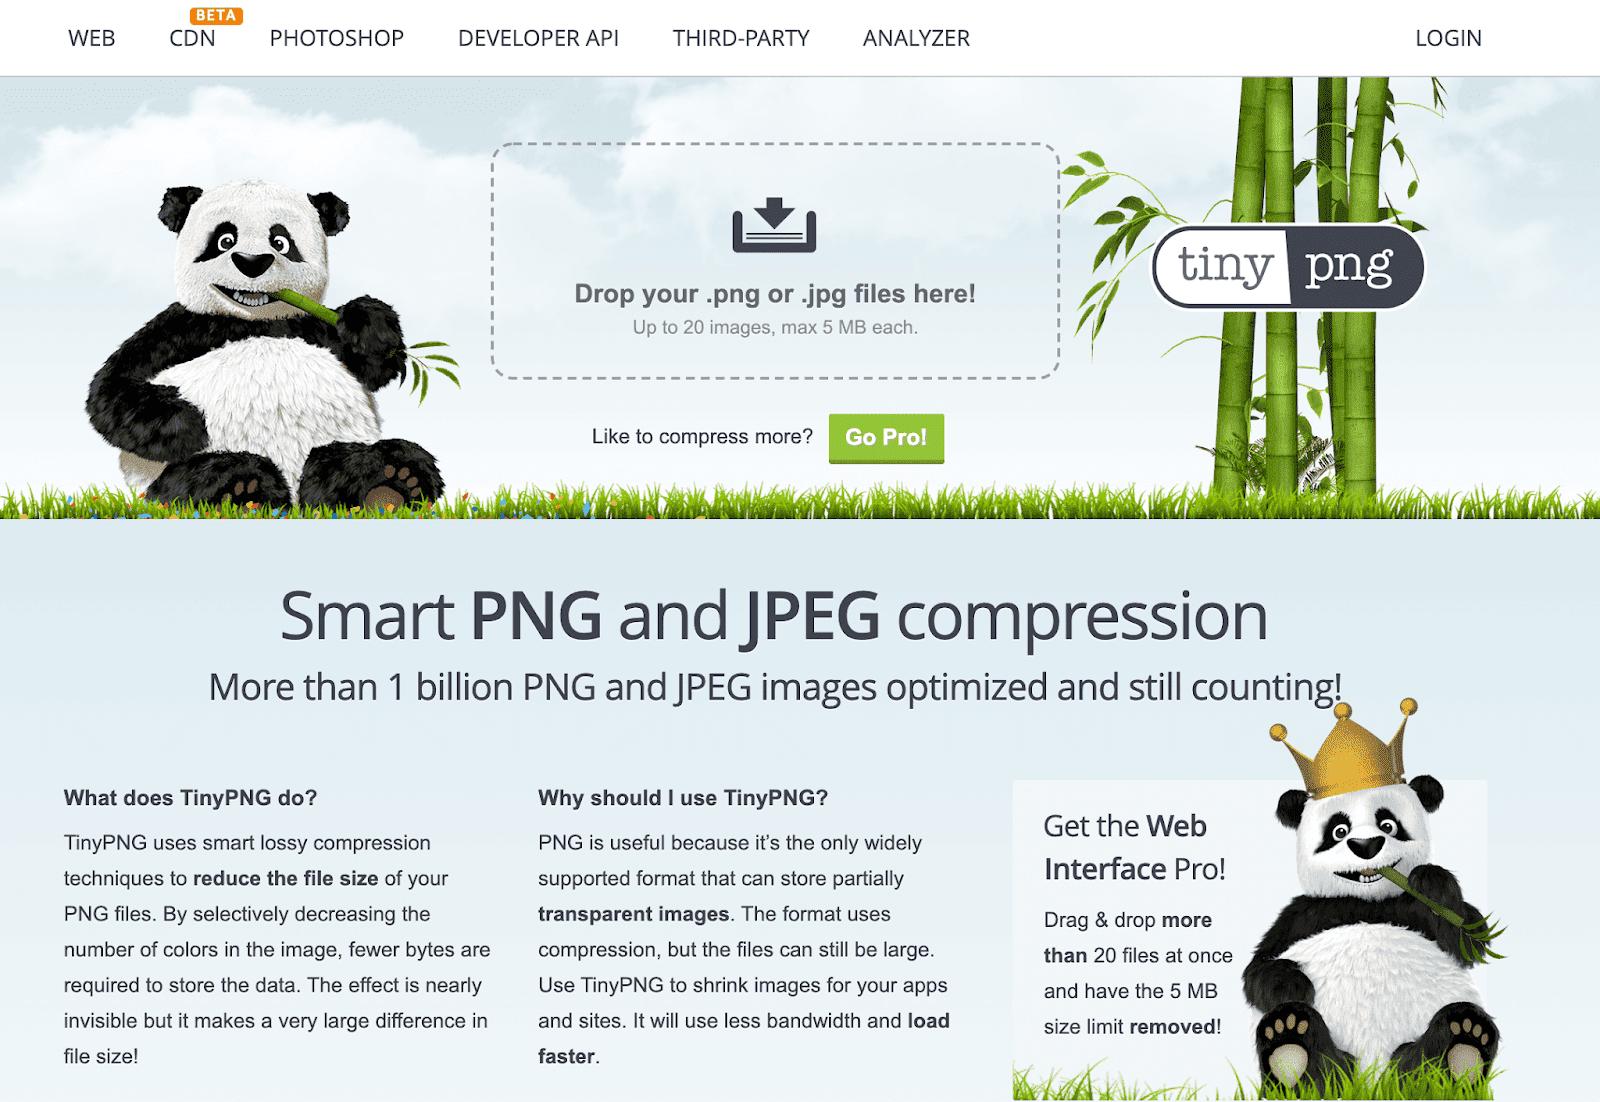 [jpg smaller] tinypng.com에서 이미지 압축하기